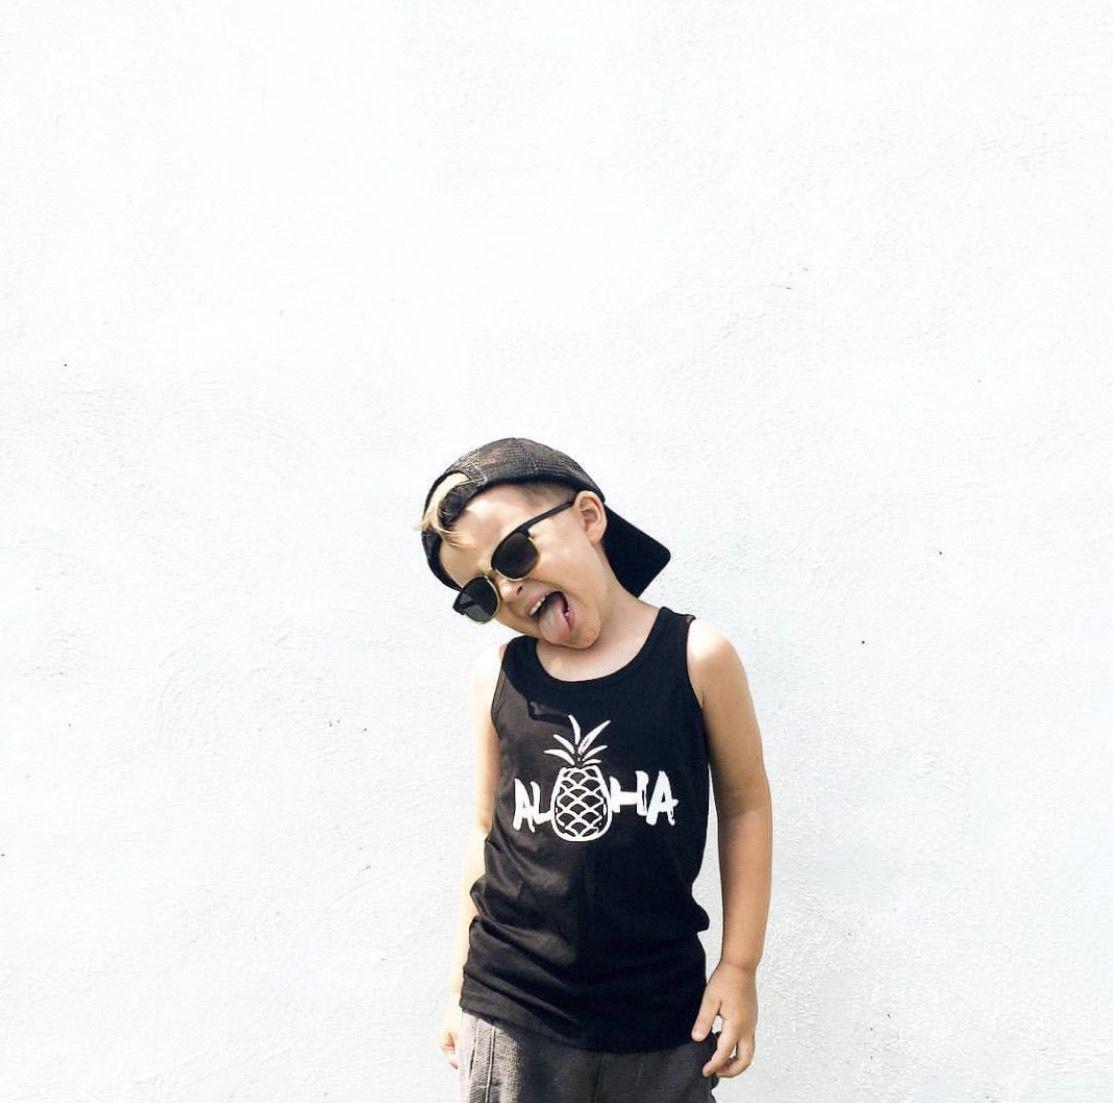 5b8d99fa Beach baby shirt. Baby boy shirt. Boys summer shirt. Surfer boy shirt. Boys  tank top. Boys graphic tee shirt